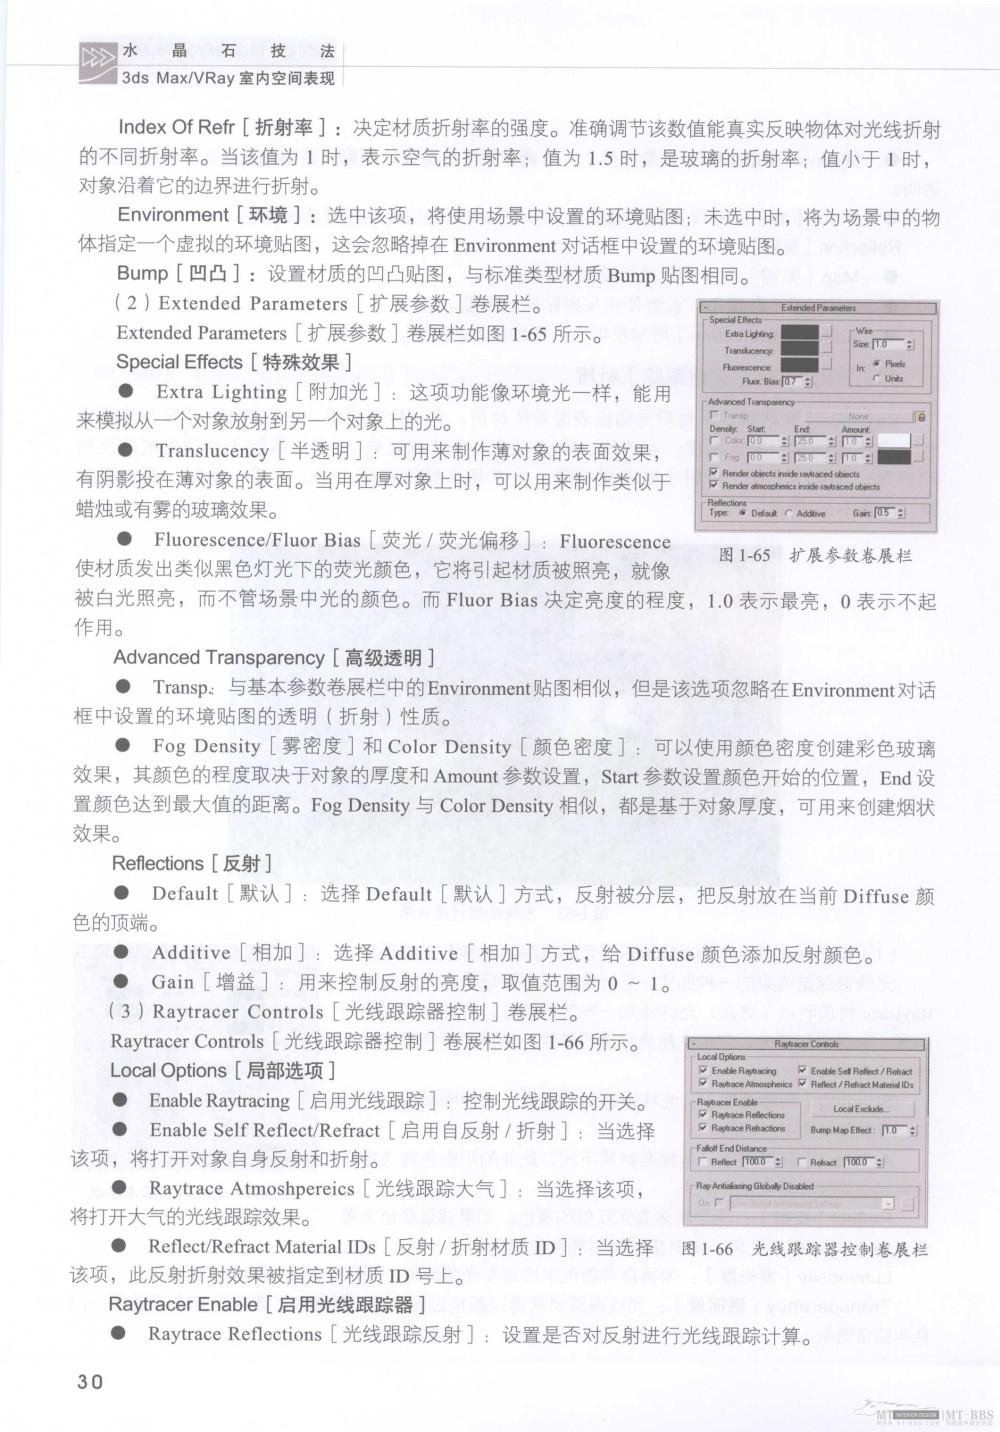 水晶石技法-3ds_Max&VRay室内空间表现_水晶石技法-3ds_Max&VRay室内空间表现_页面_036.jpg